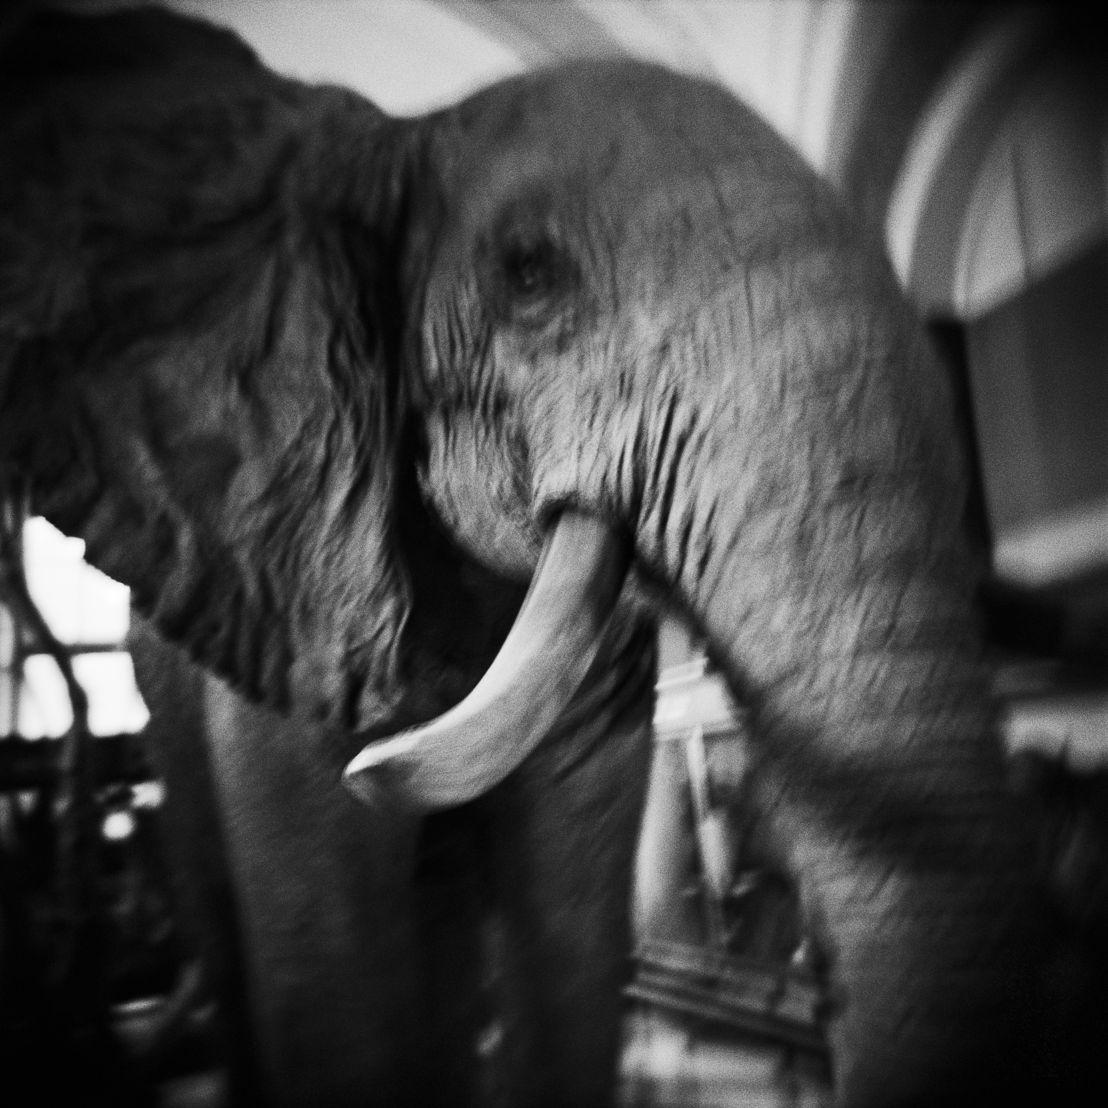 Elephant, 2015 © Olivier Leu